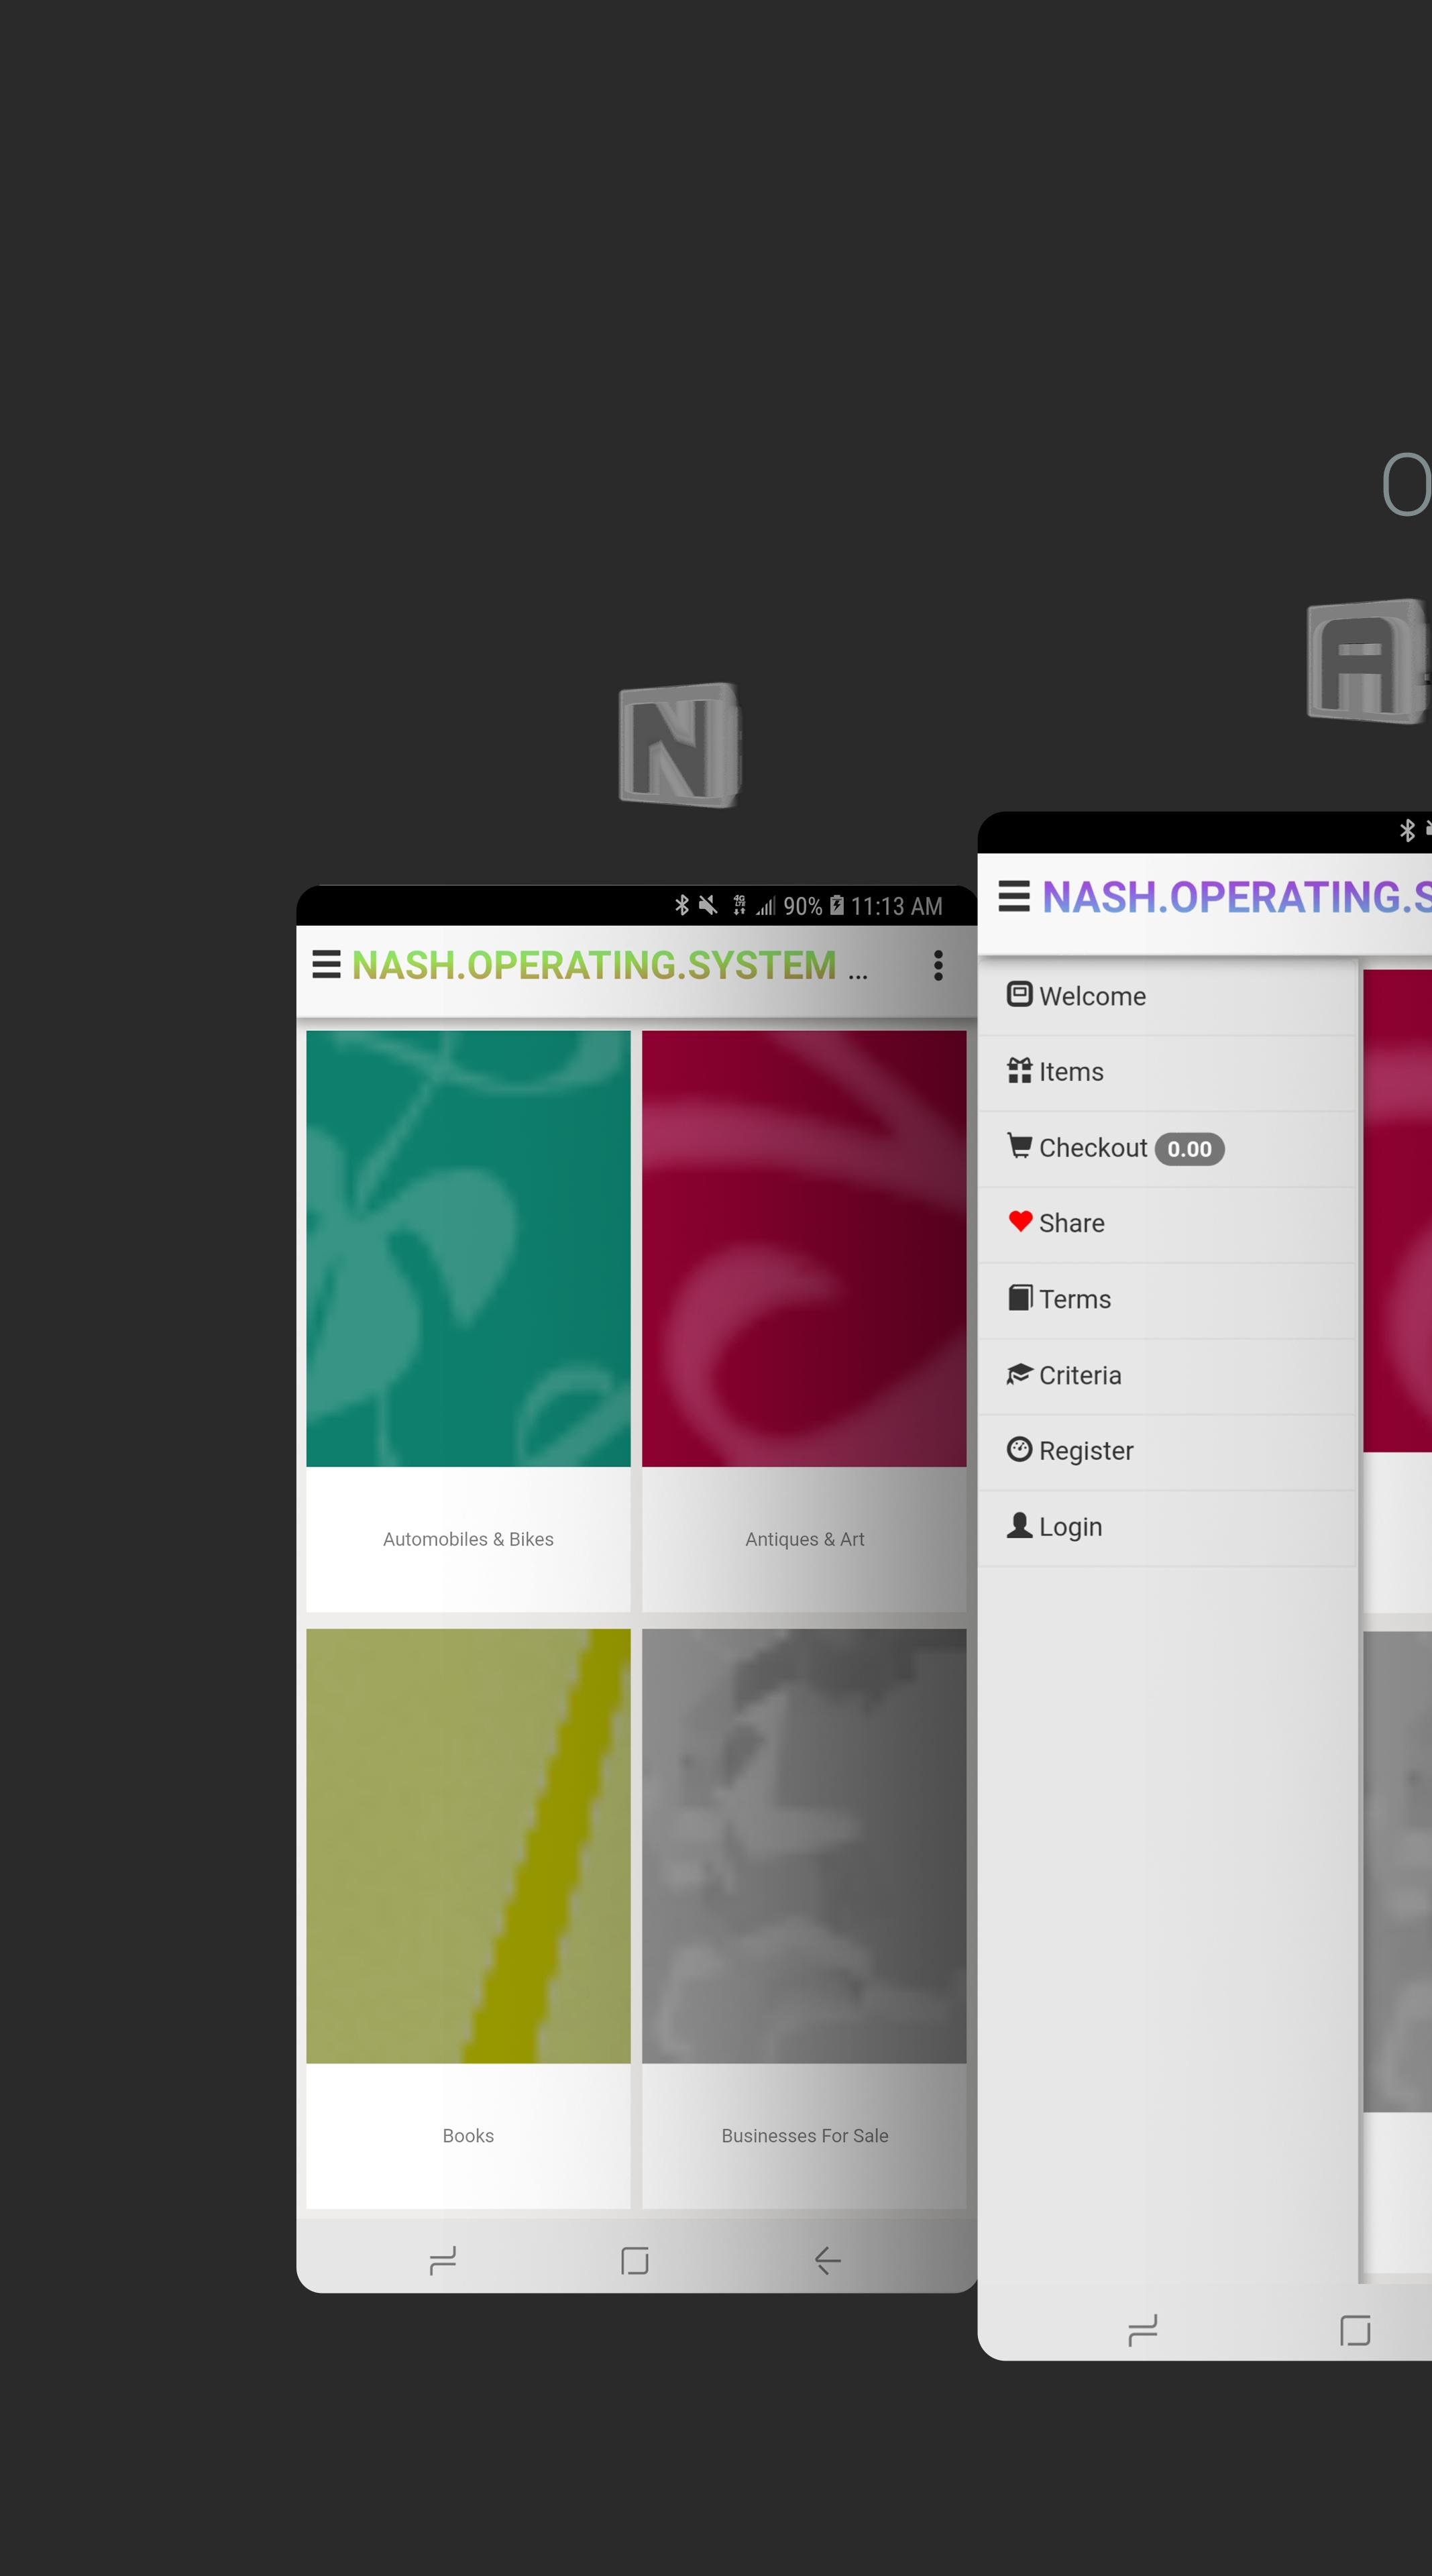 NASH OS APP (MOBILE DEMO) screenshot 1